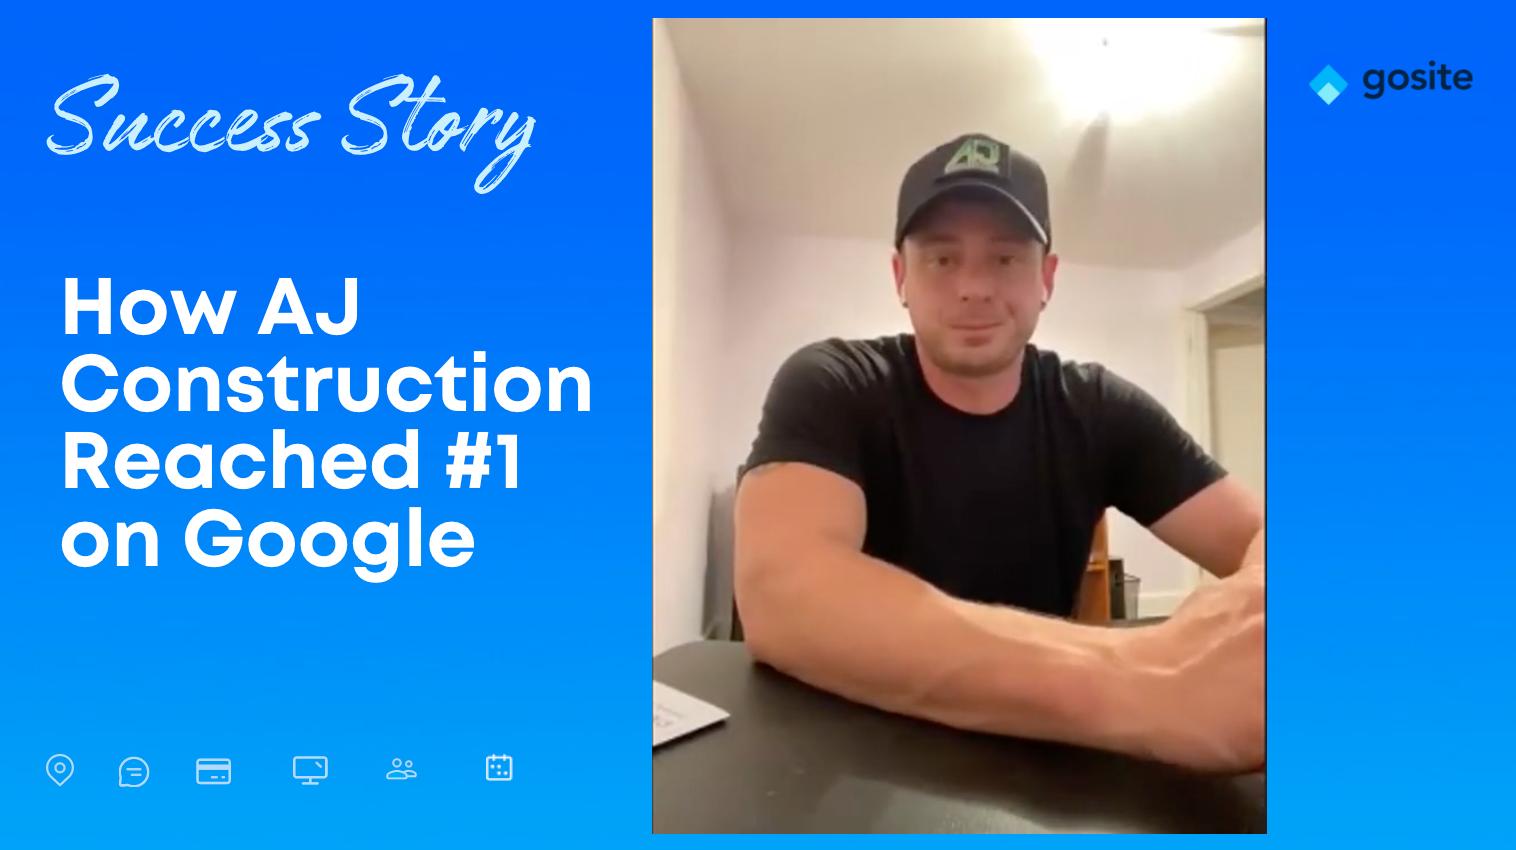 AJ construction success story